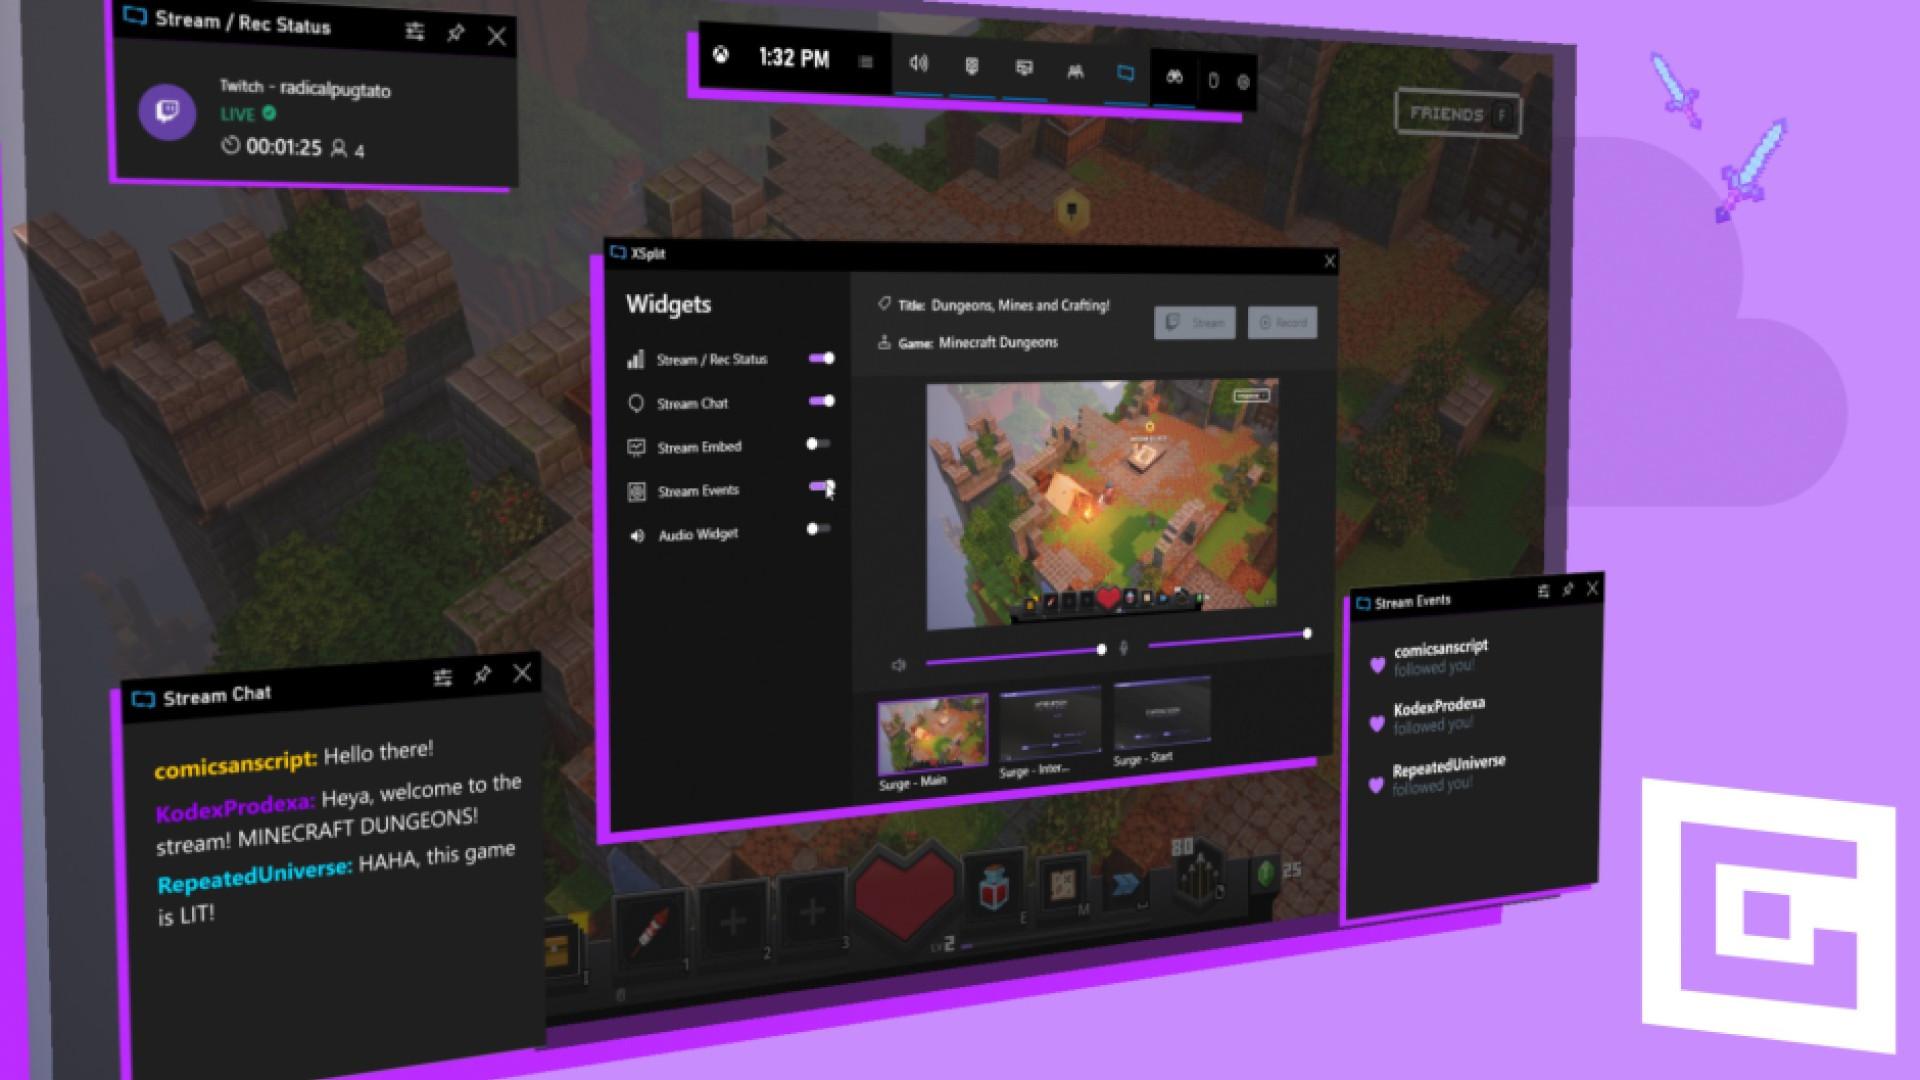 Xbox Game Bar - Keeps resetting widget layout and sizing when application runs GC_Gamebar_SS2.jpg